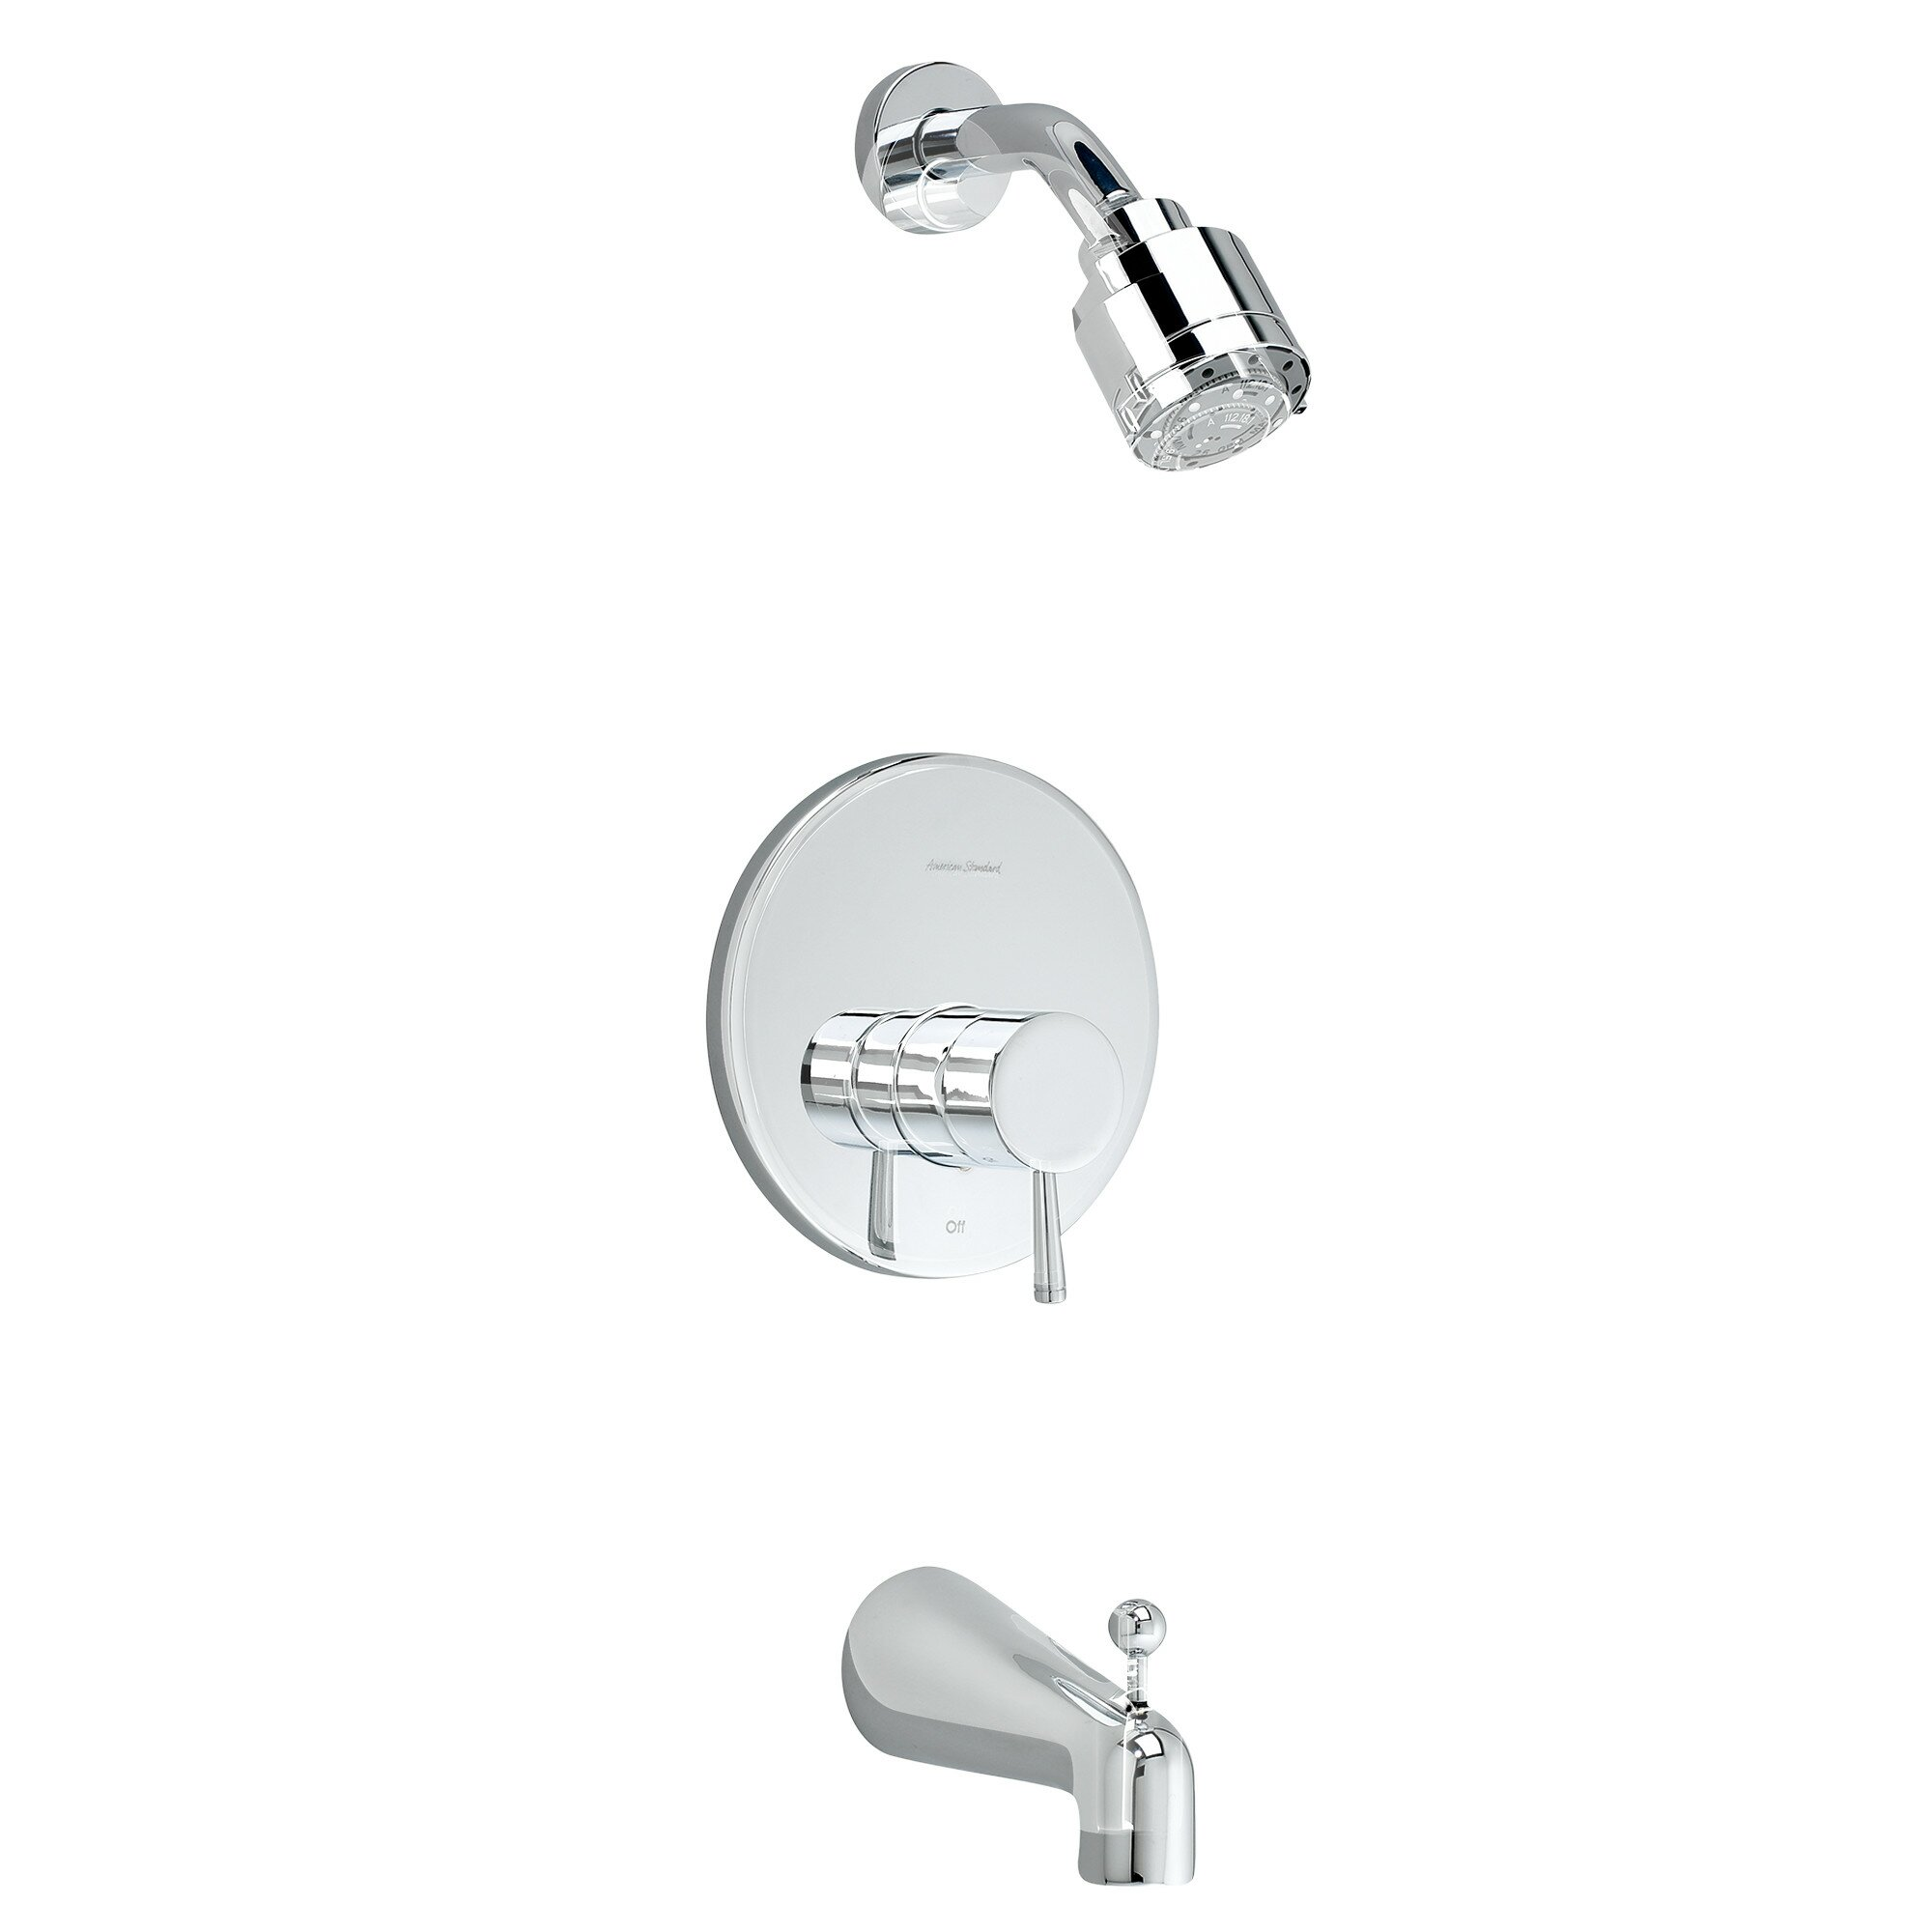 American Standard Serin Diverter Bath/Shower Faucet Trim Kit ... - American Standard Serin Diverter Bath/Shower Faucet Trim Kit